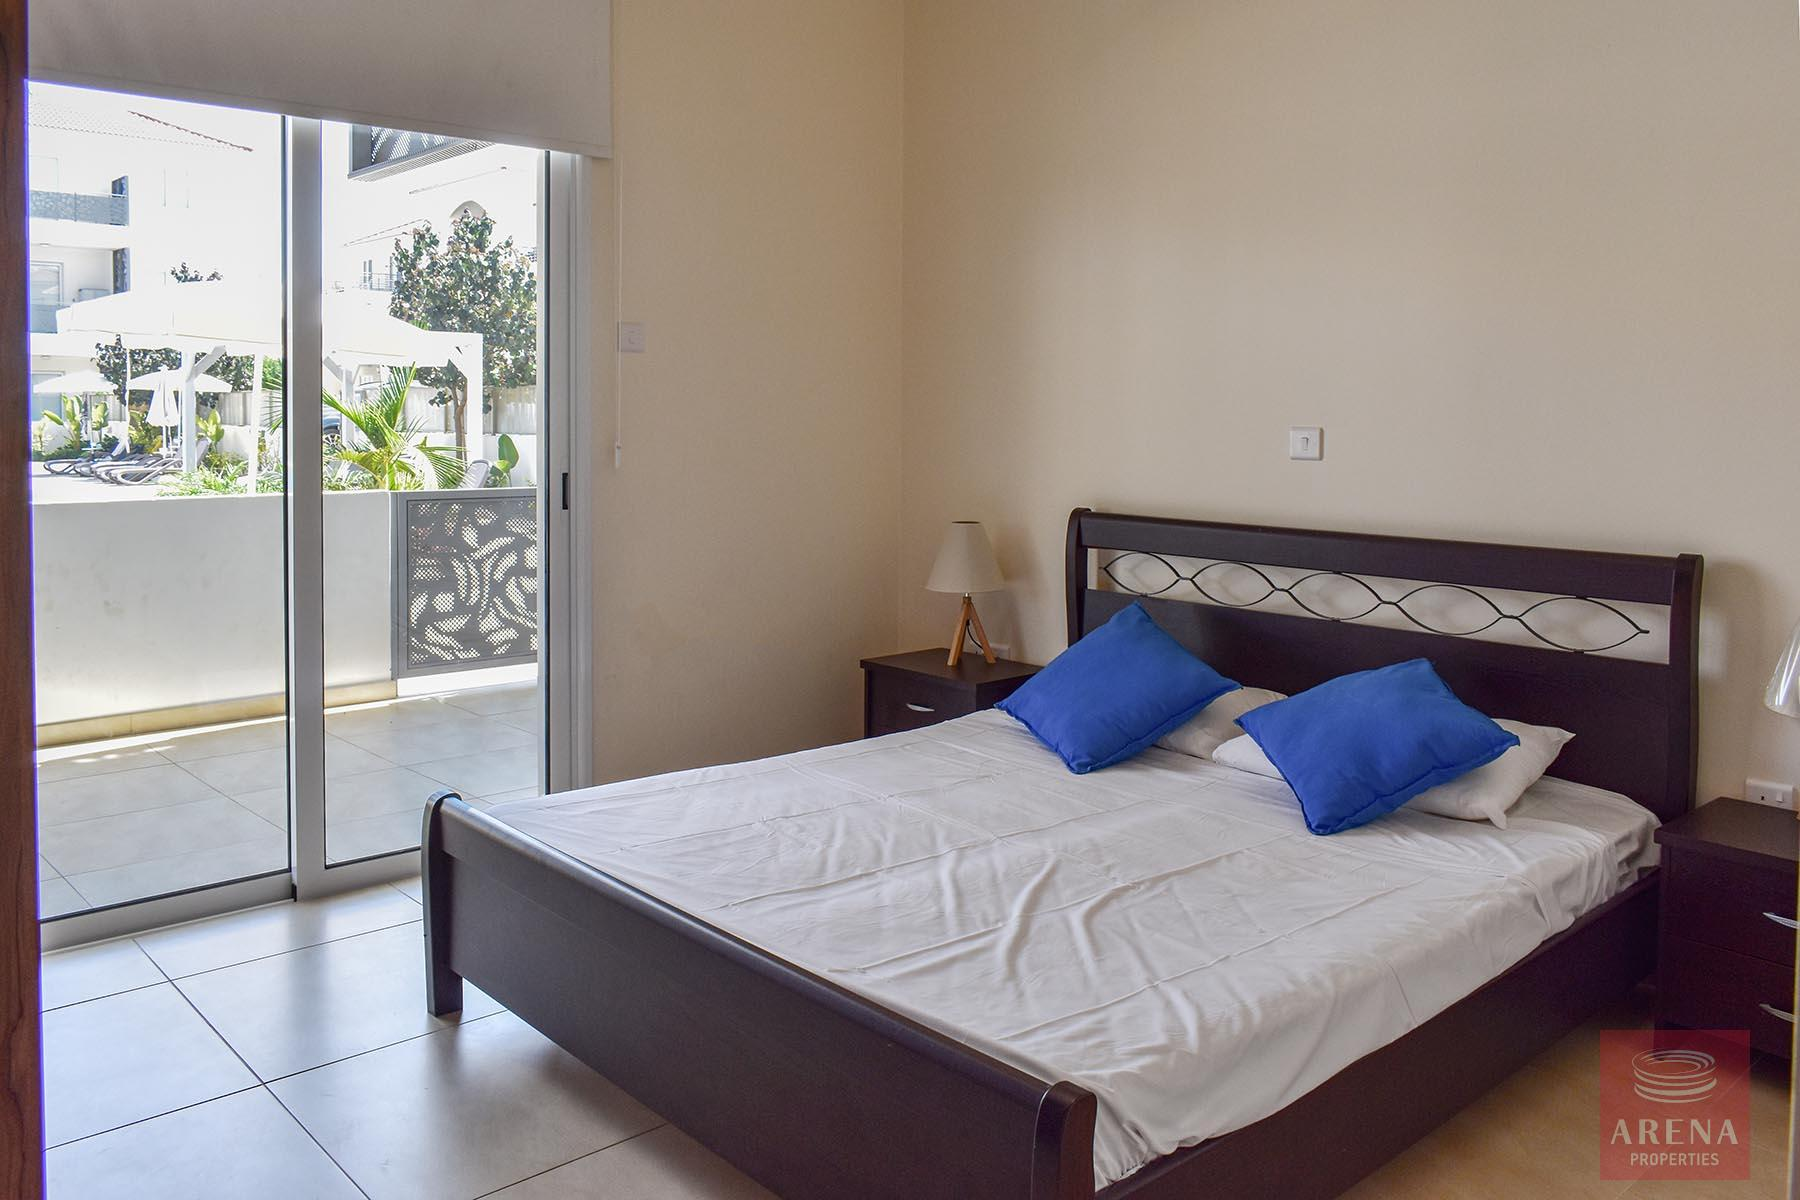 Ground Floor Apartment in Kapparis - bedroom